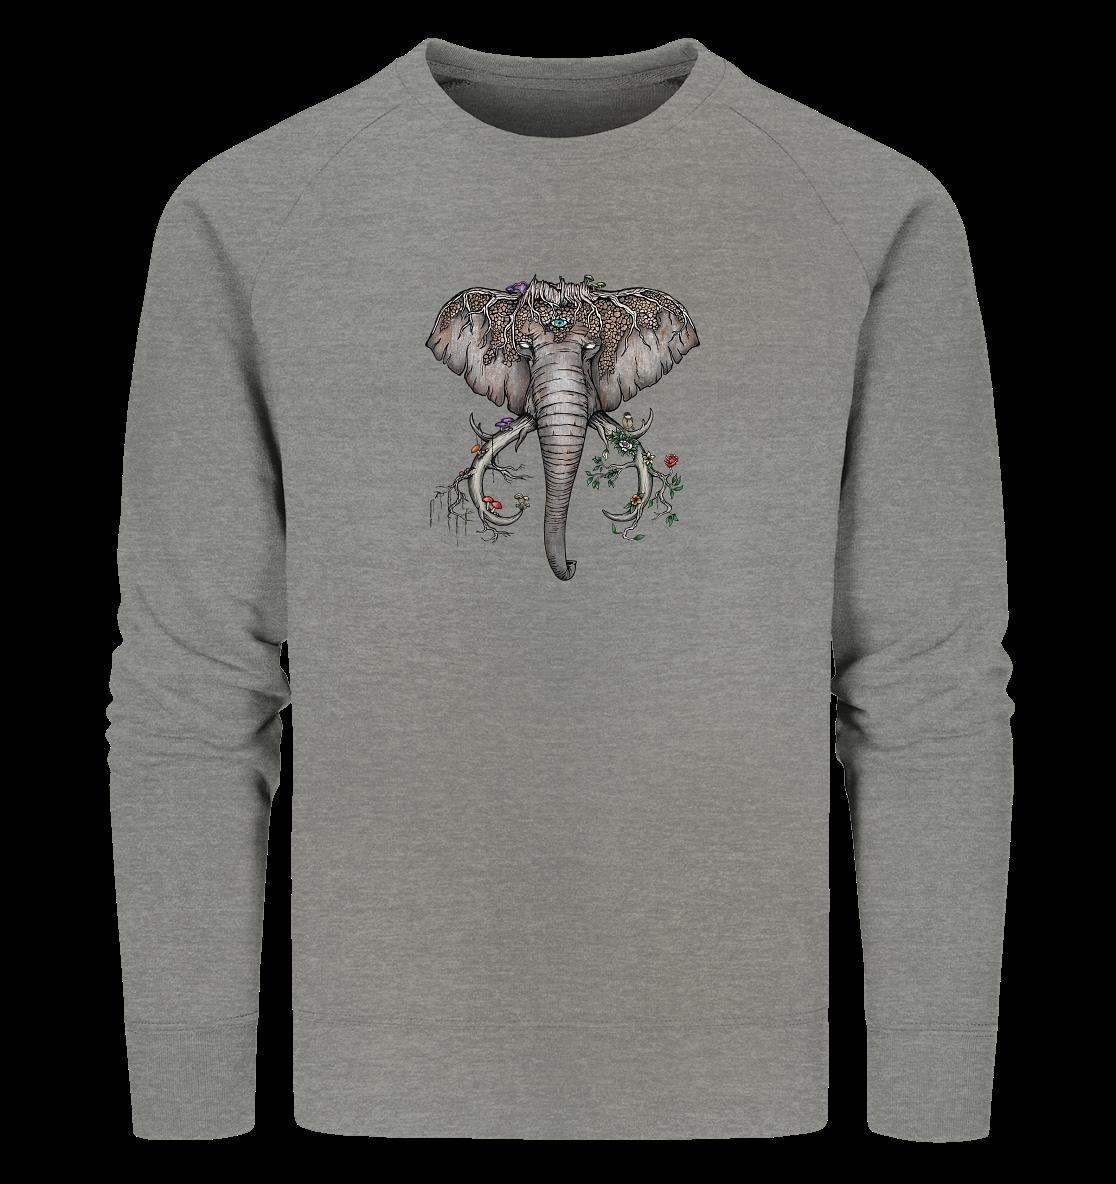 front-organic-sweatshirt-818381-1116x-2.png